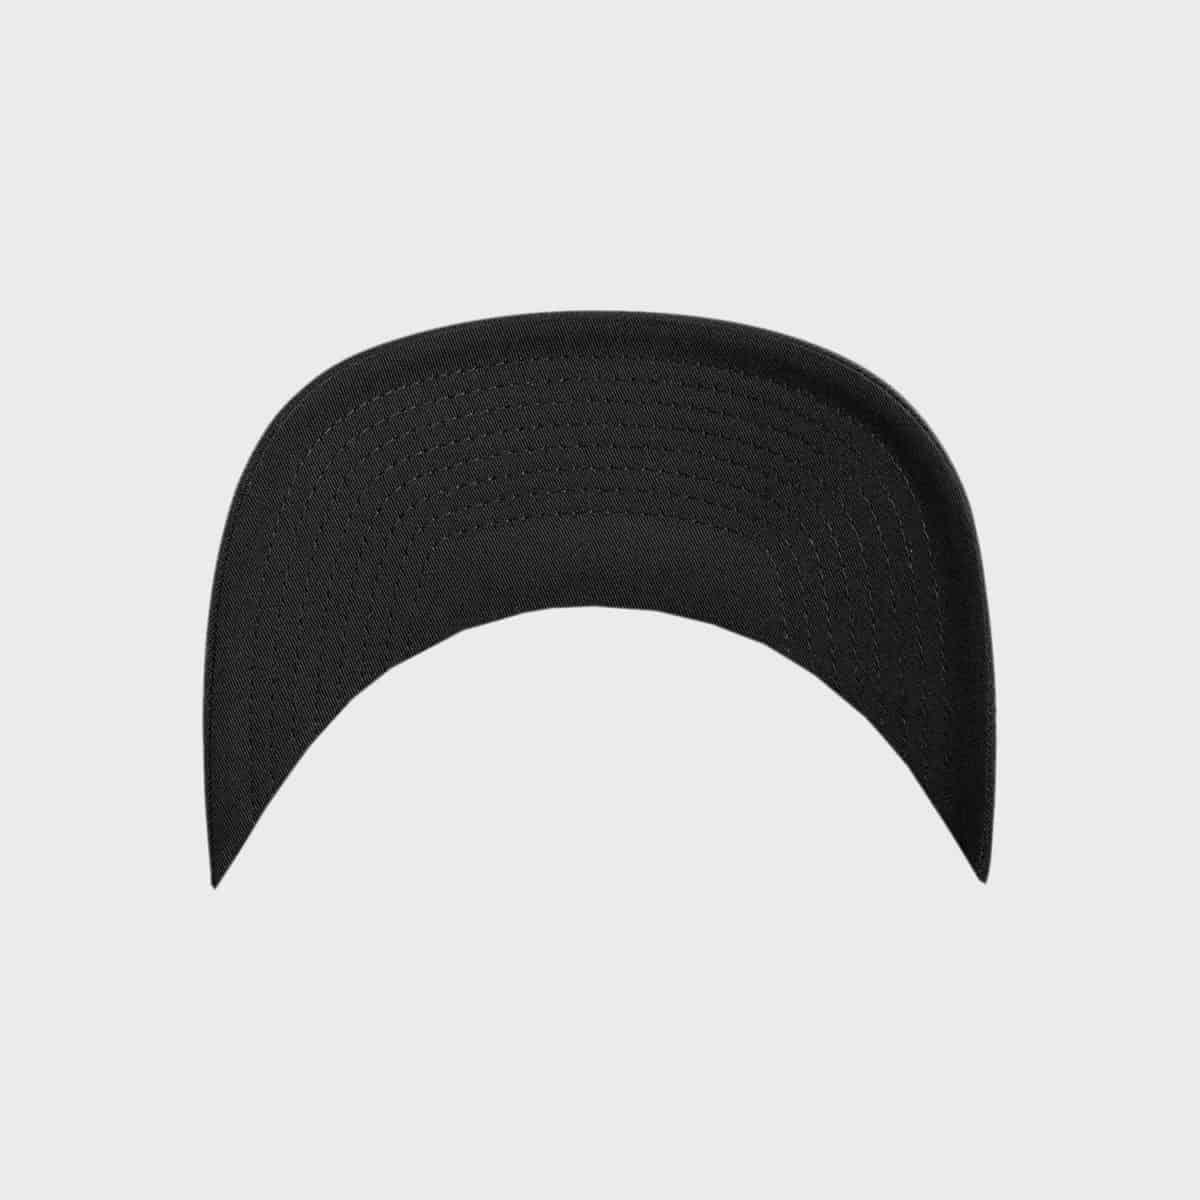 Flexfit FlexfitCaps FFE 6533 Black Schirm